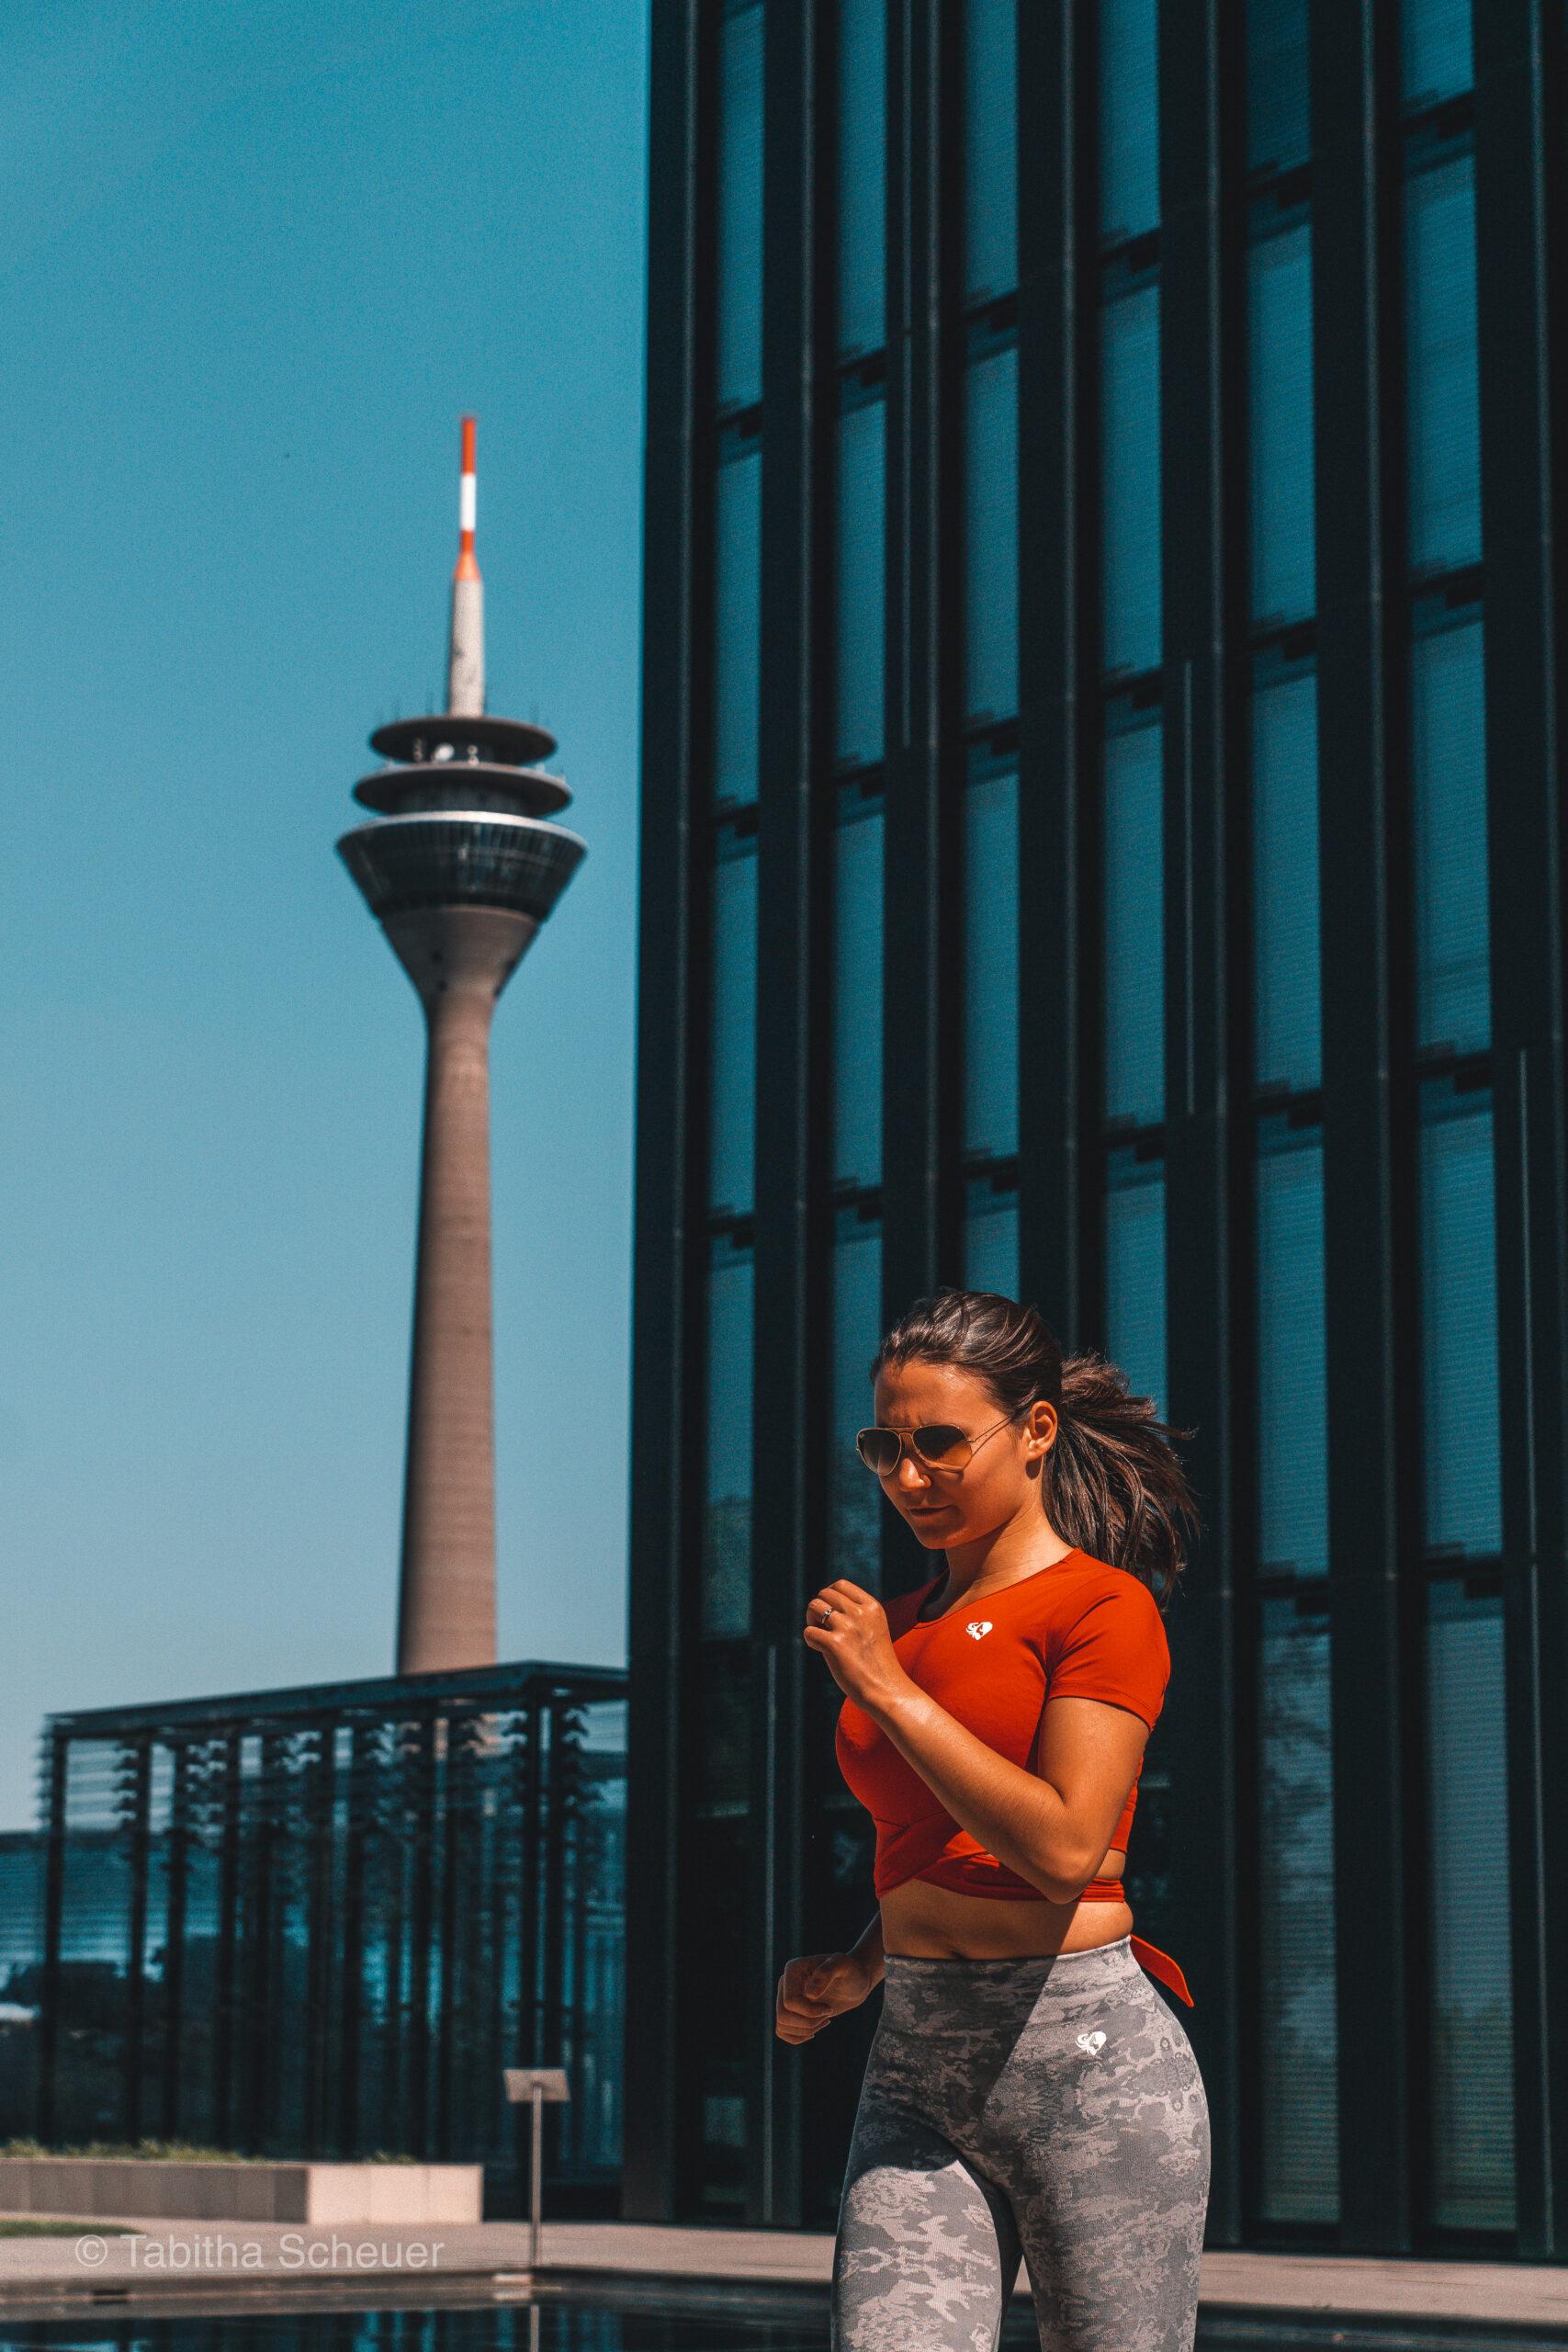 Running through Düsseldorf |Photography Poses for Women